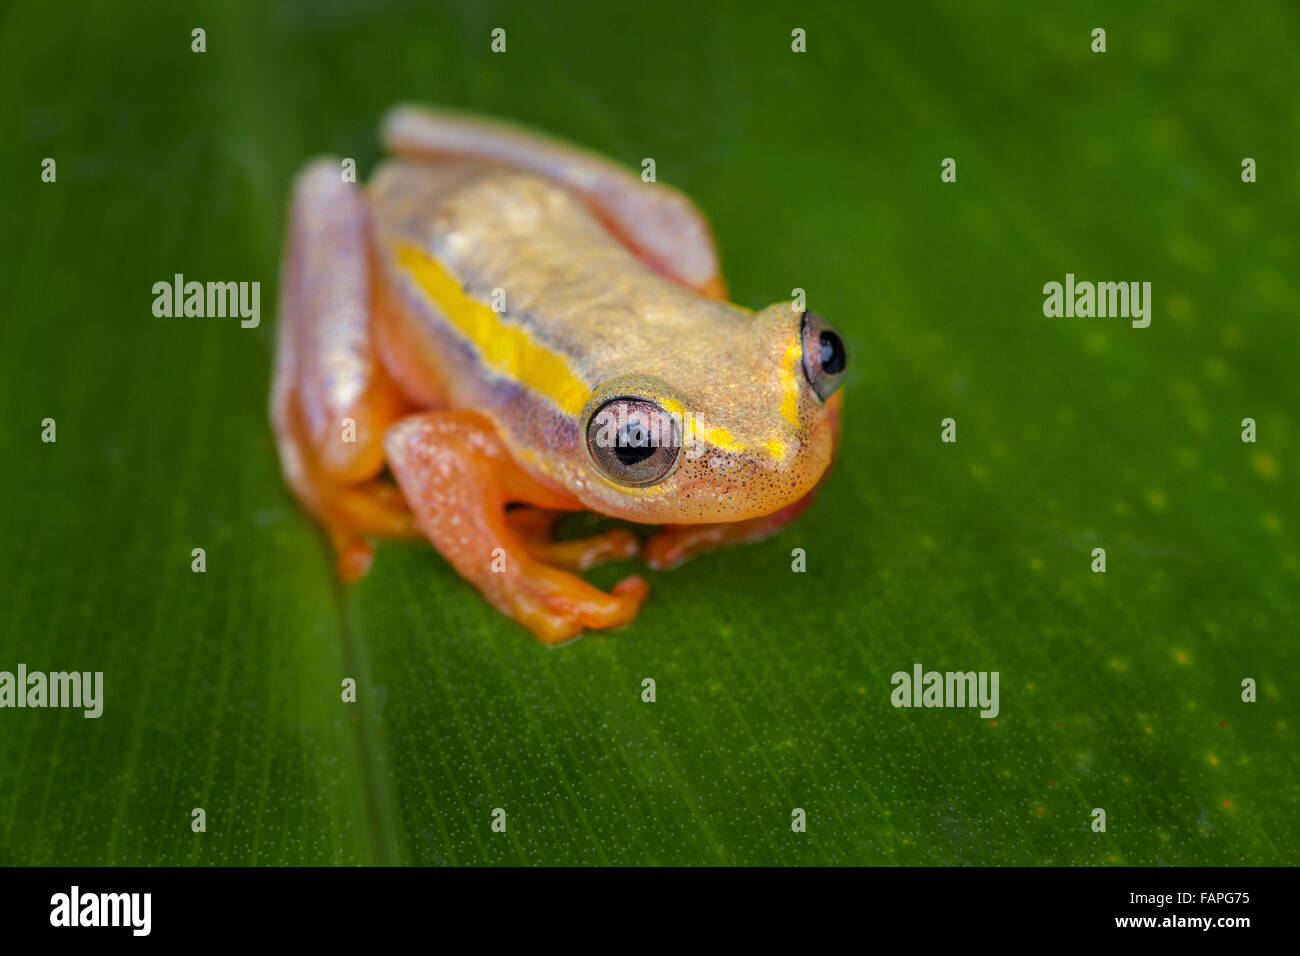 A tiny tree frog on a leaf, Andasibe National Park, Madagascar. Stock Photo